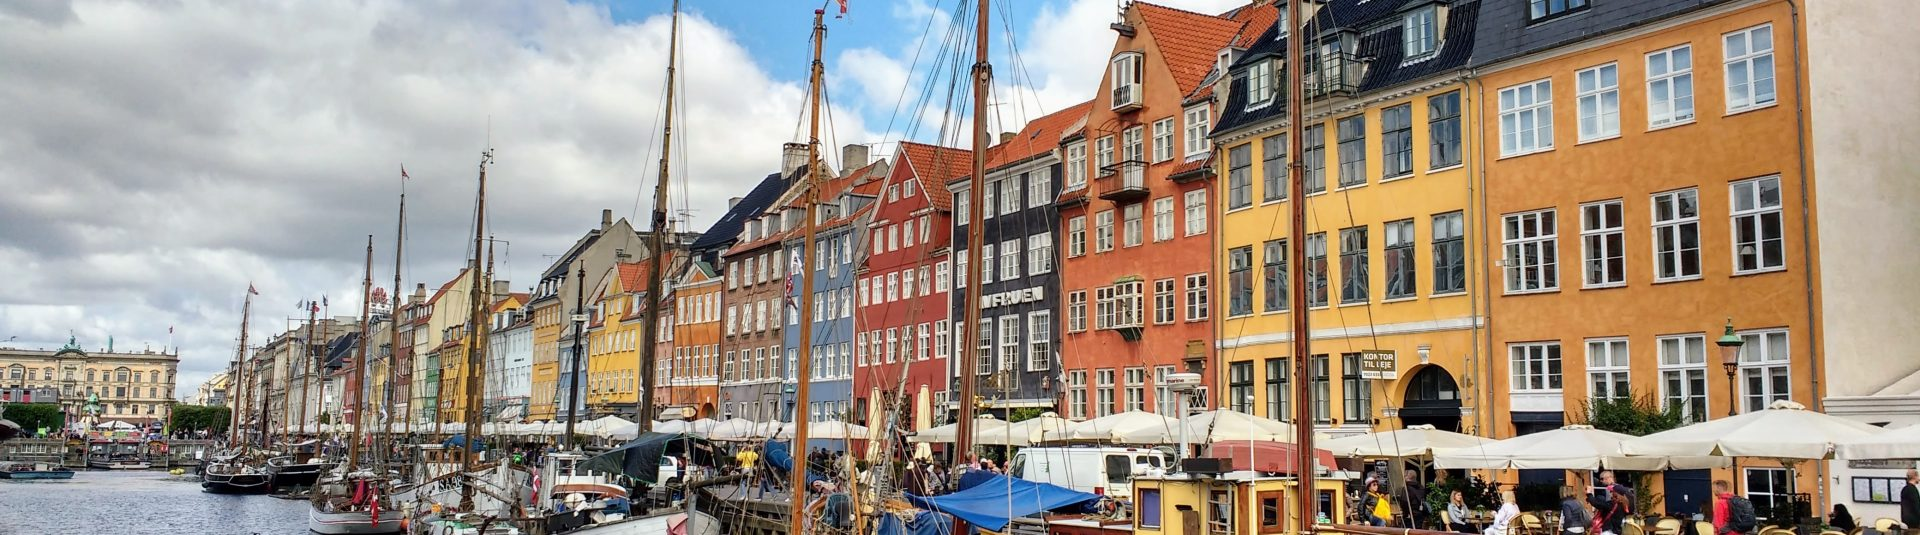 "<a href=""http://www.directoryofdestinations.com/country/denmark/"" rel=""tag"">Denmark</a>"